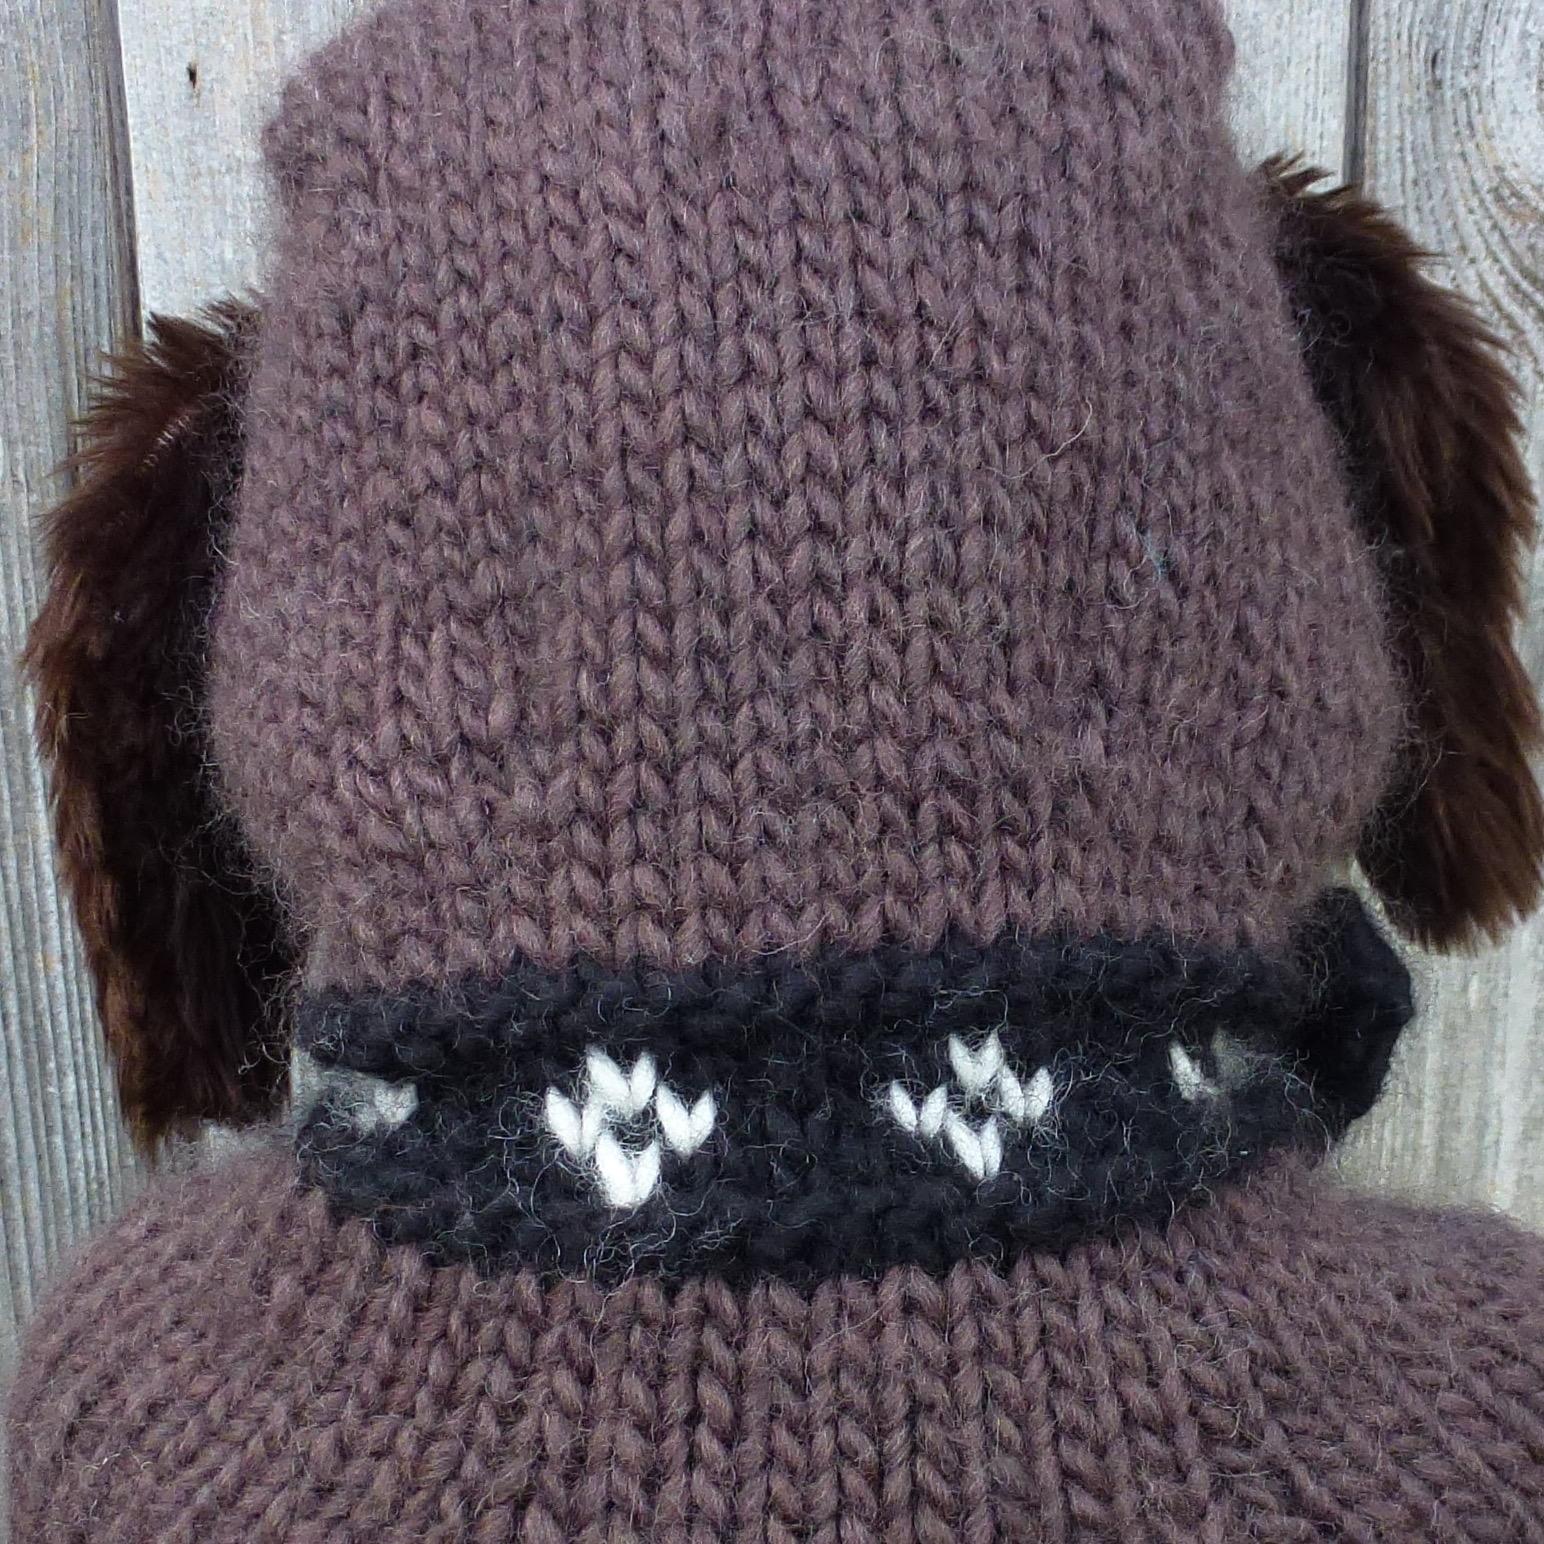 430 Dog knit 2